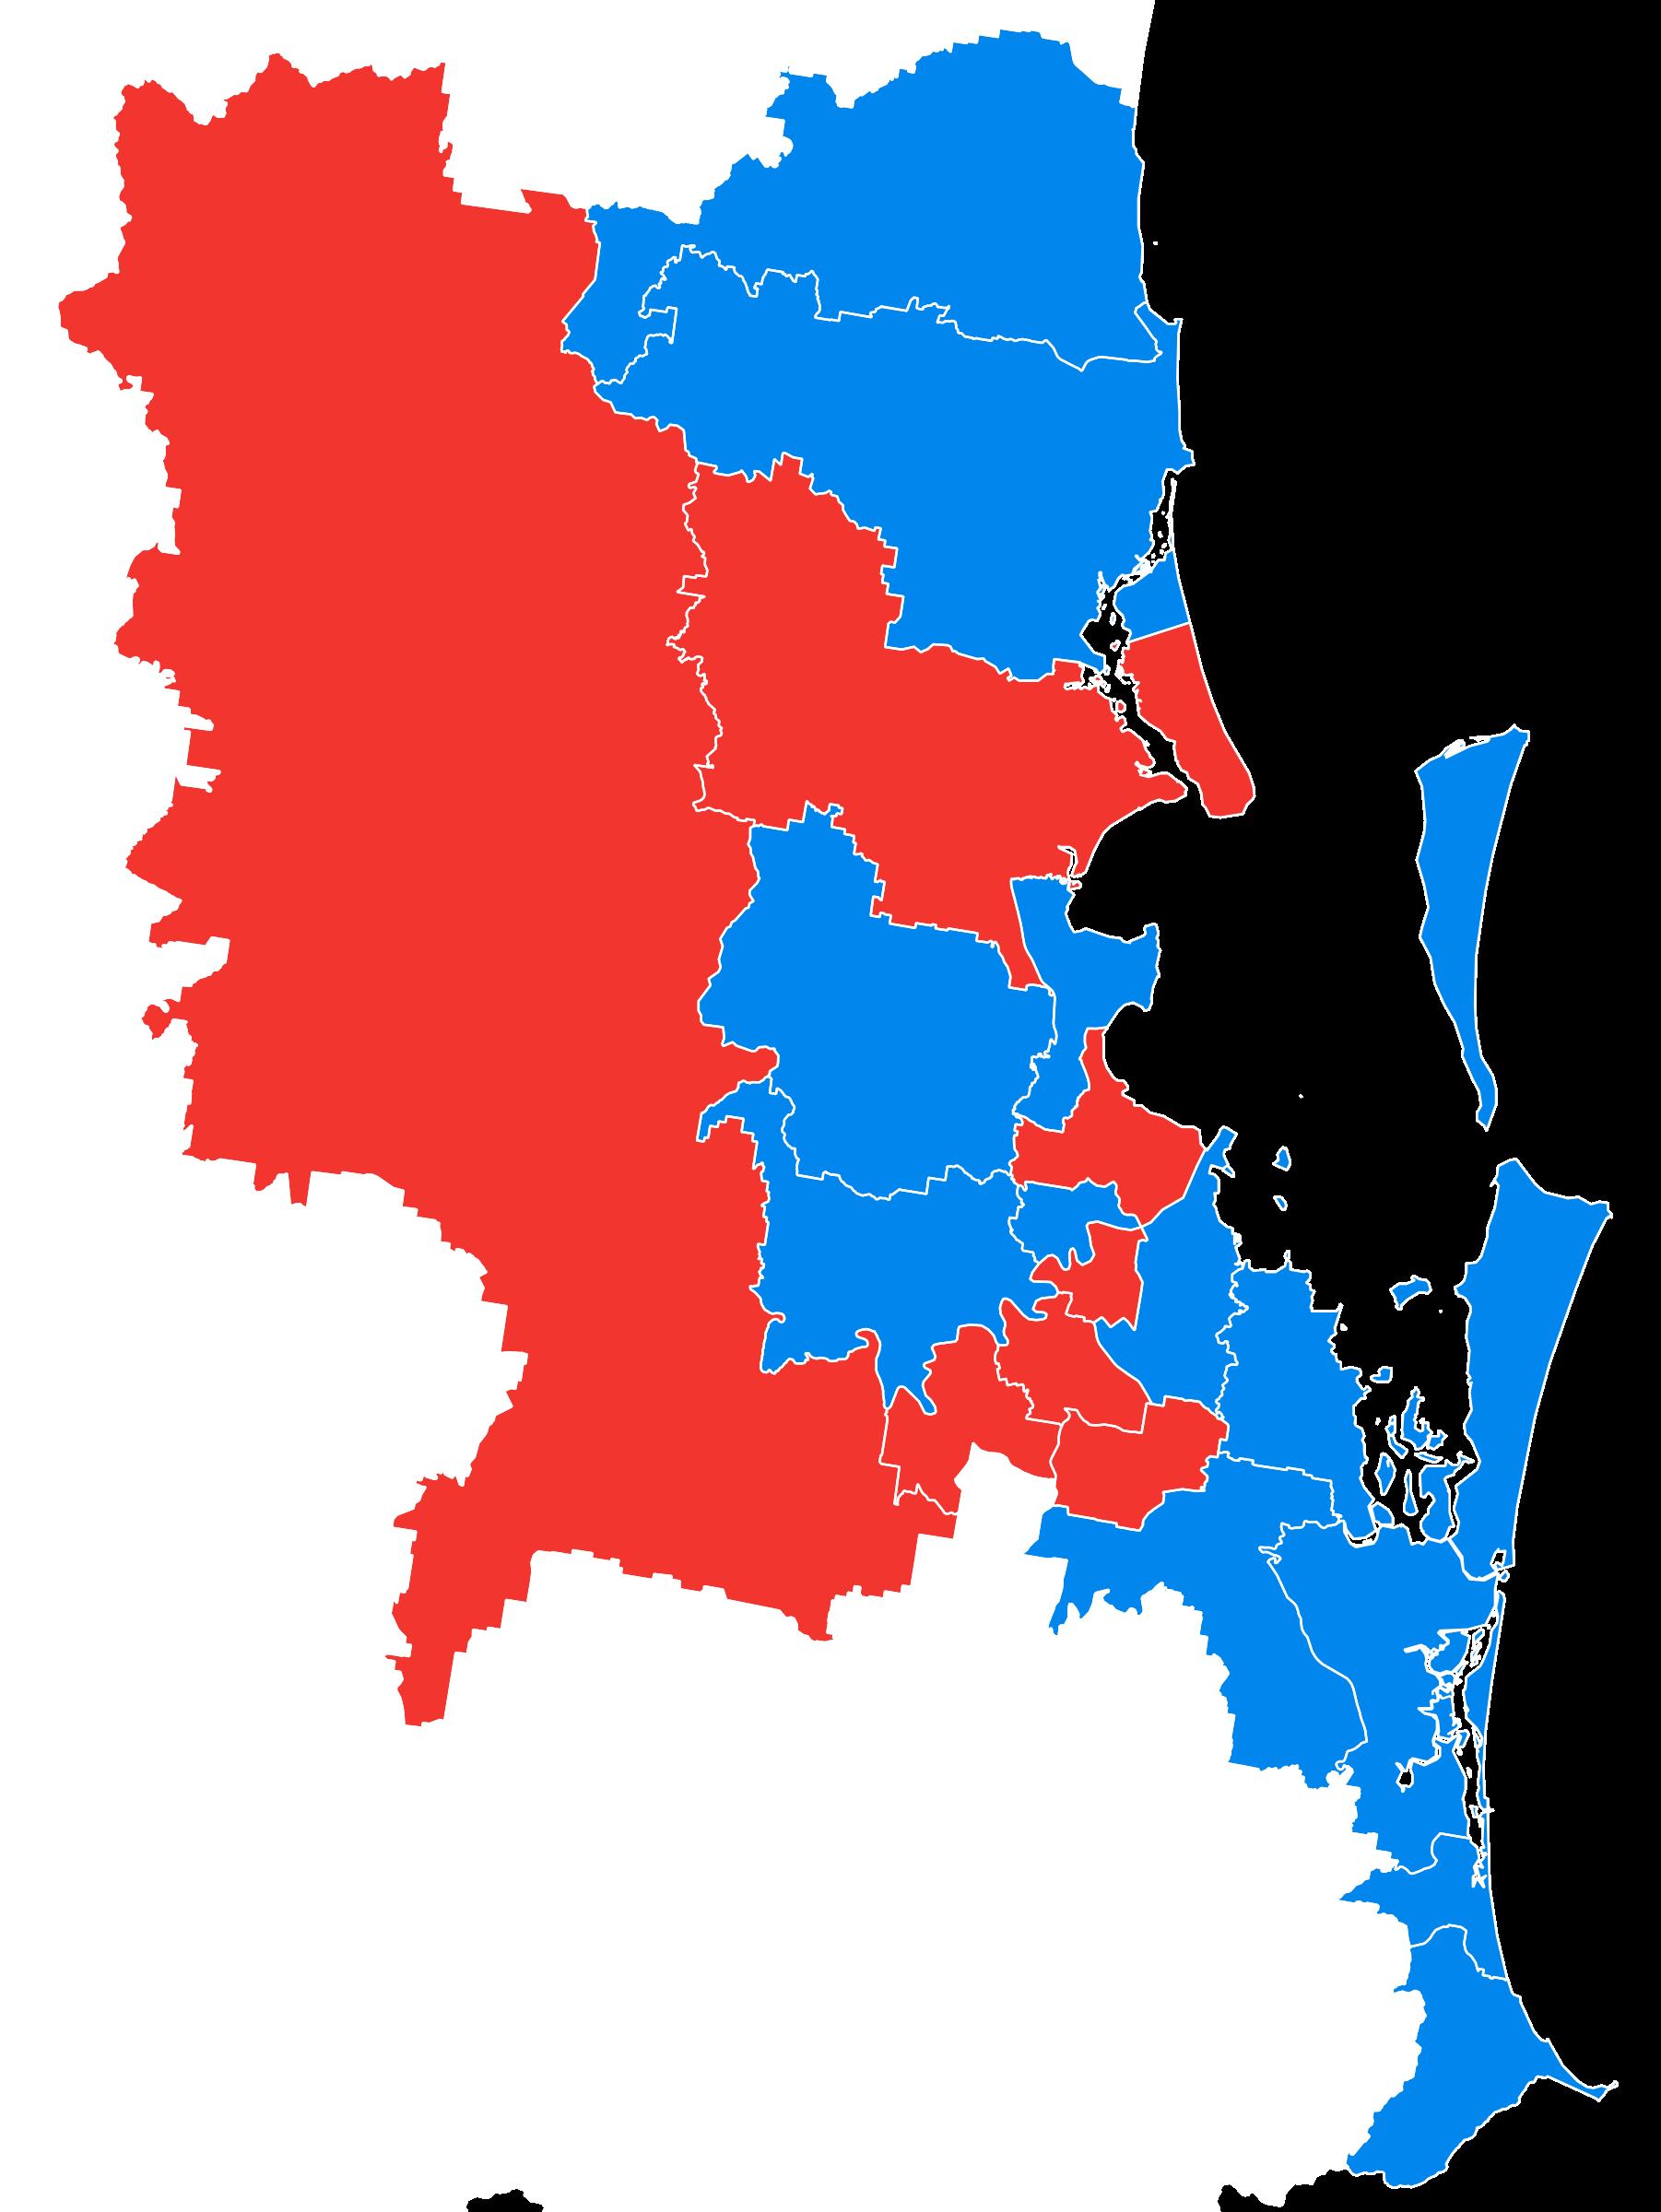 Primary dates in Brisbane